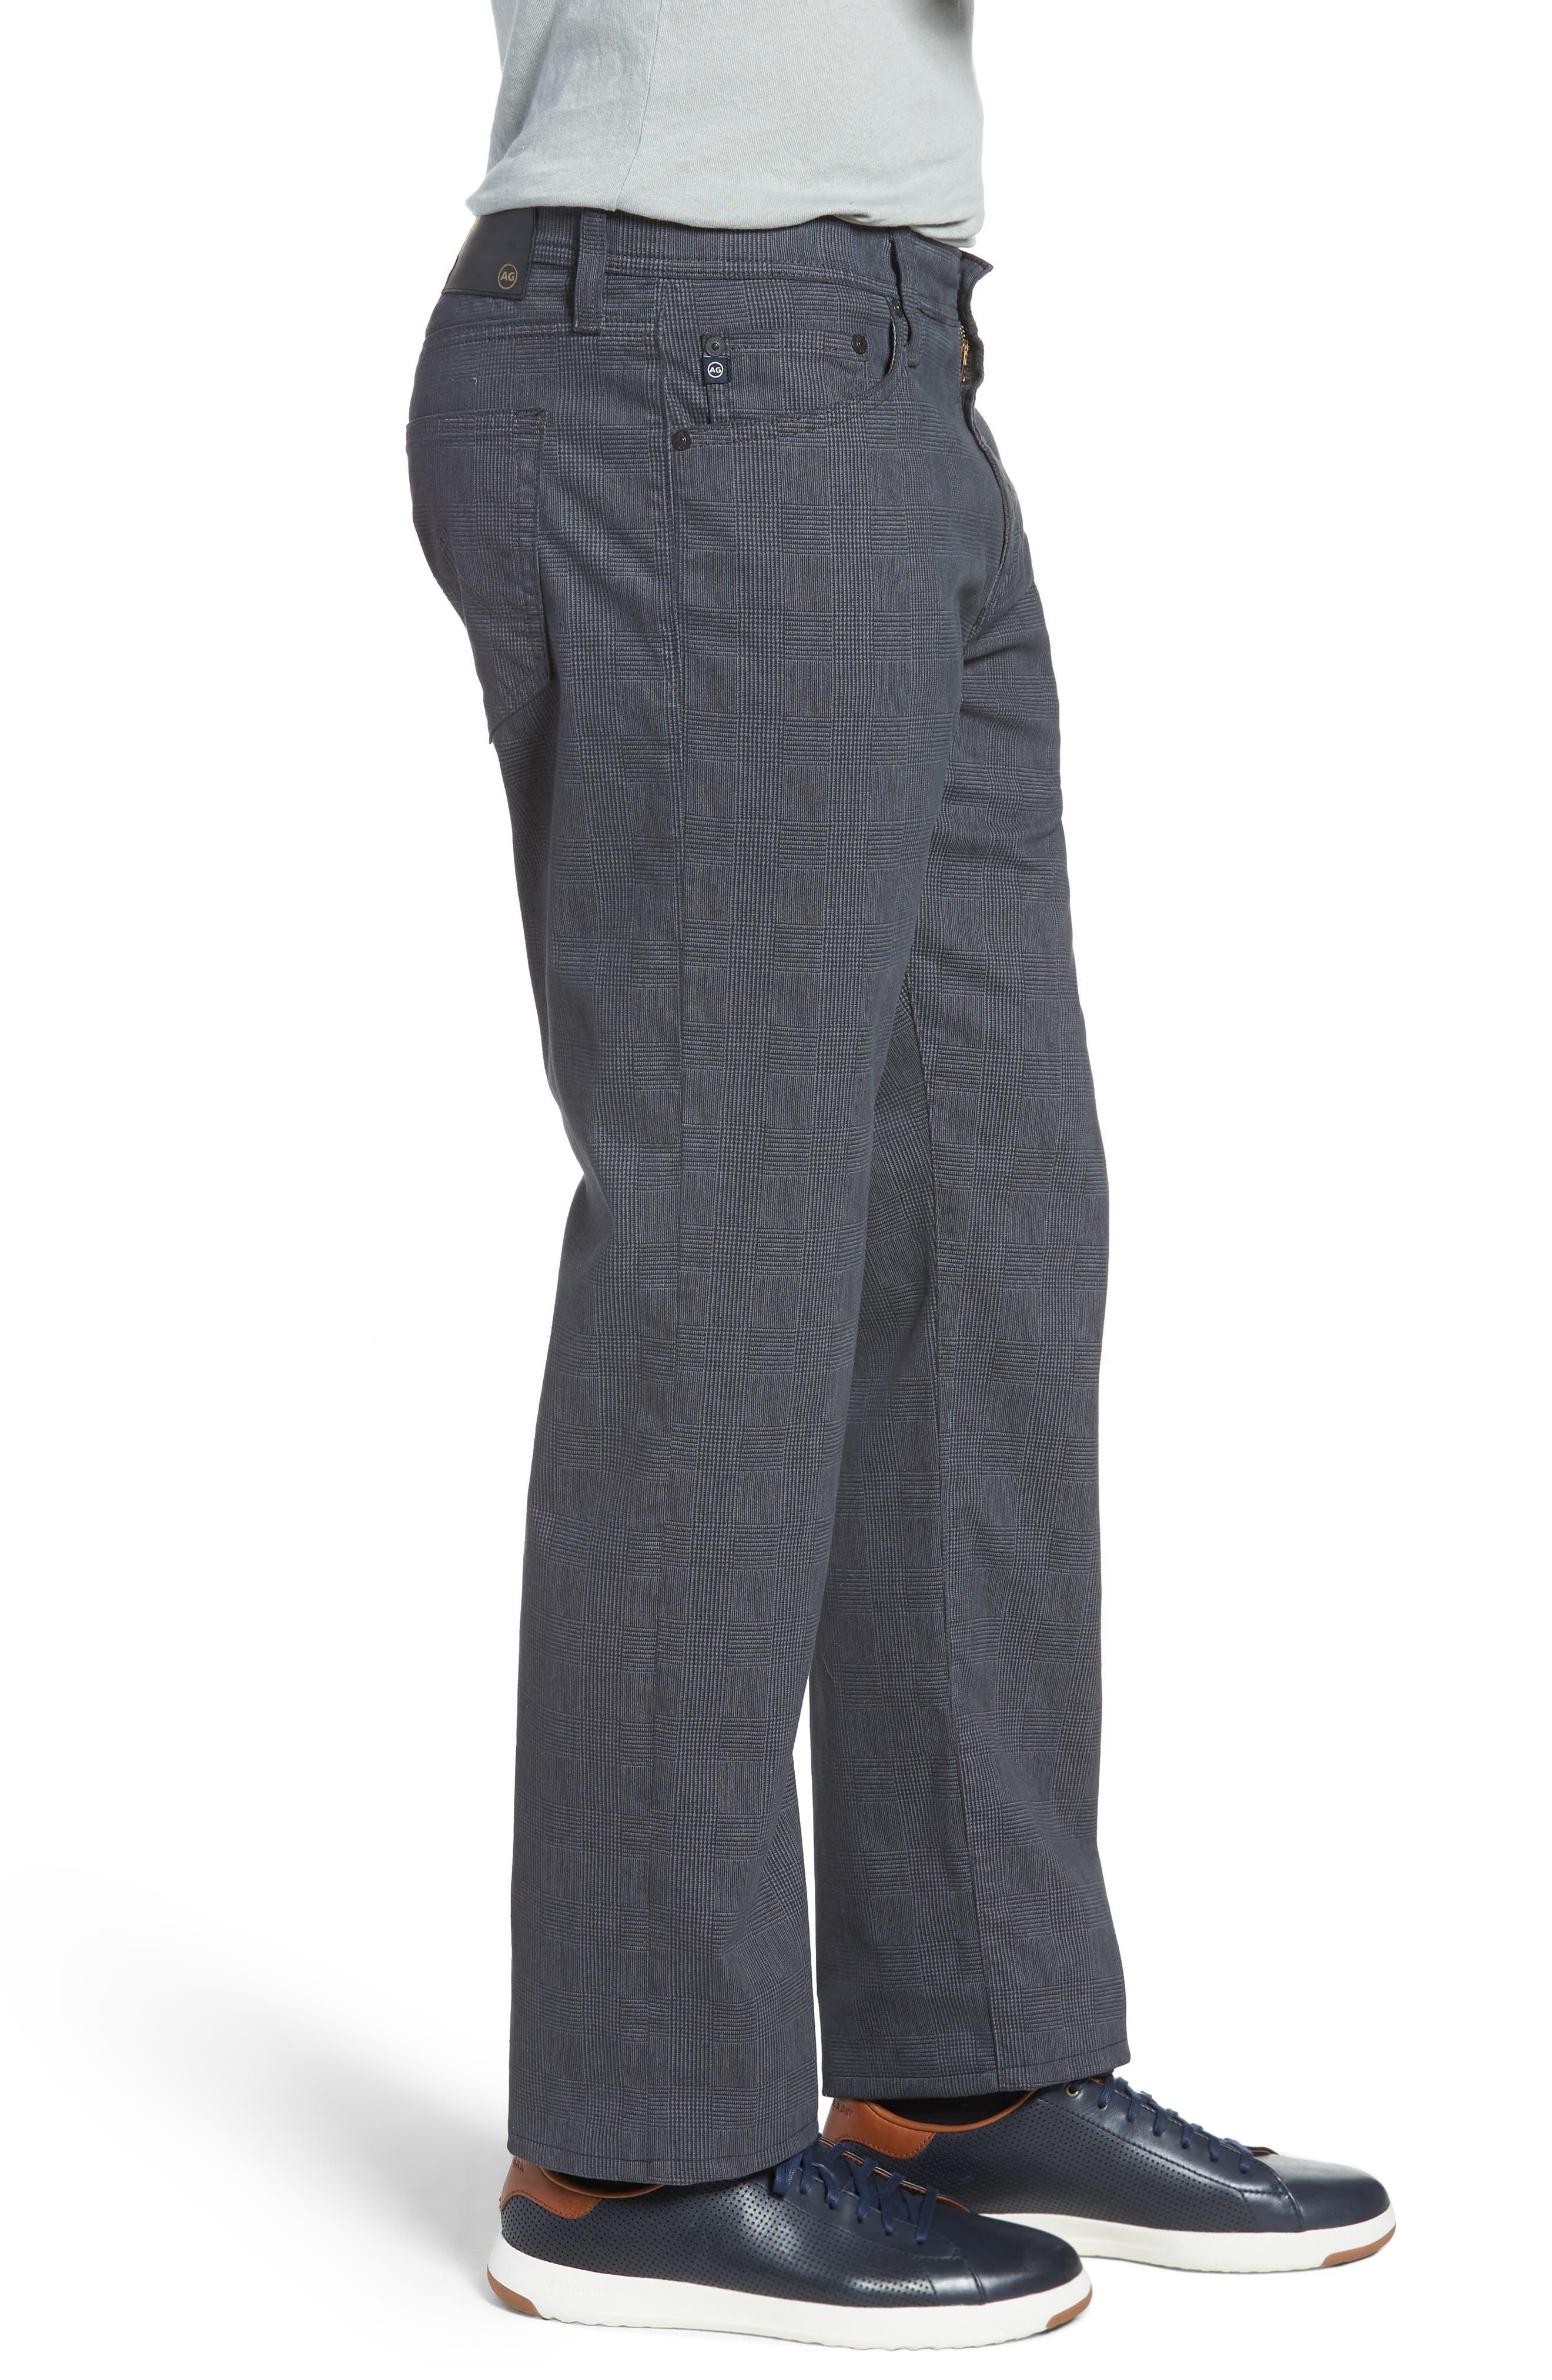 Everett SUD Print Slim Straight Leg Pants,                             Alternate thumbnail 3, color,                             FINE PLAID GREY STONE